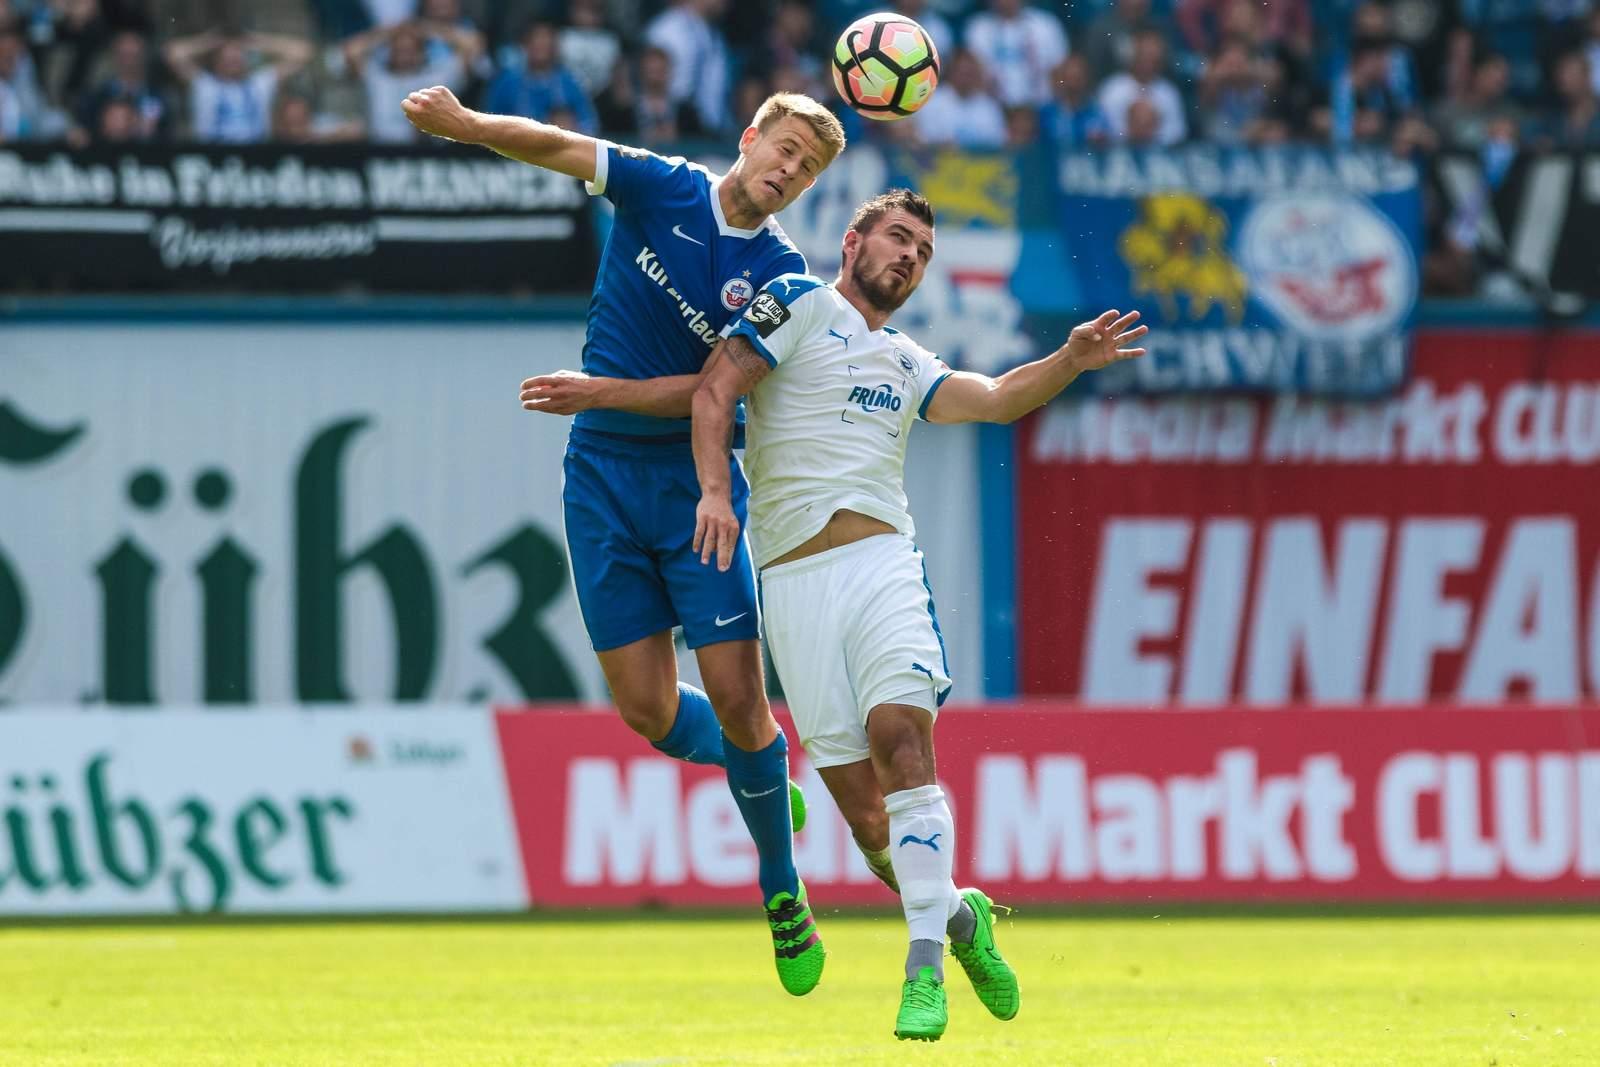 Vor Comeback für Hansa Rostock: Tommy Grupe (l.)